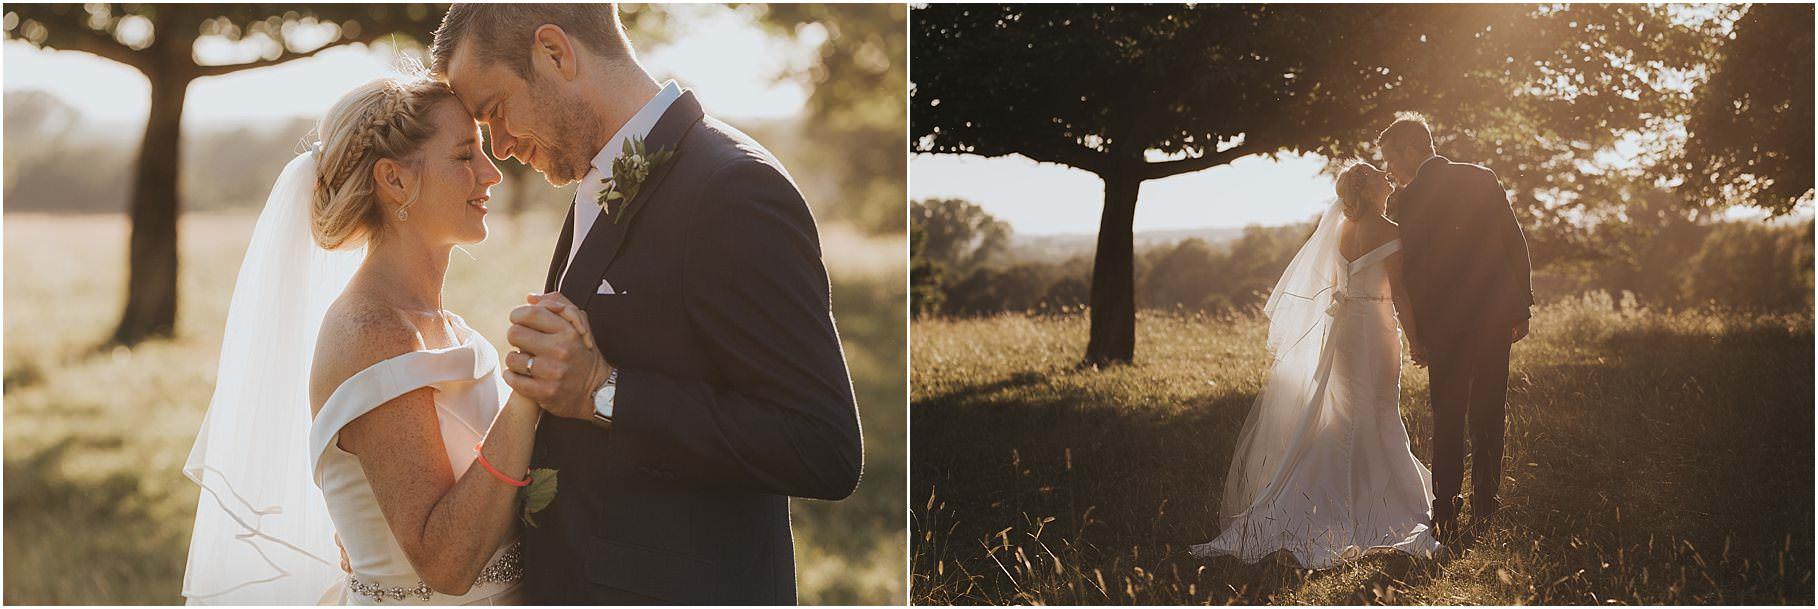 Cambridgeshire Wedding Photographer Black Horse Elton Wedding 1089 - Mr and Mrs Mac // CAMBRIDGESHIRE WEDDING